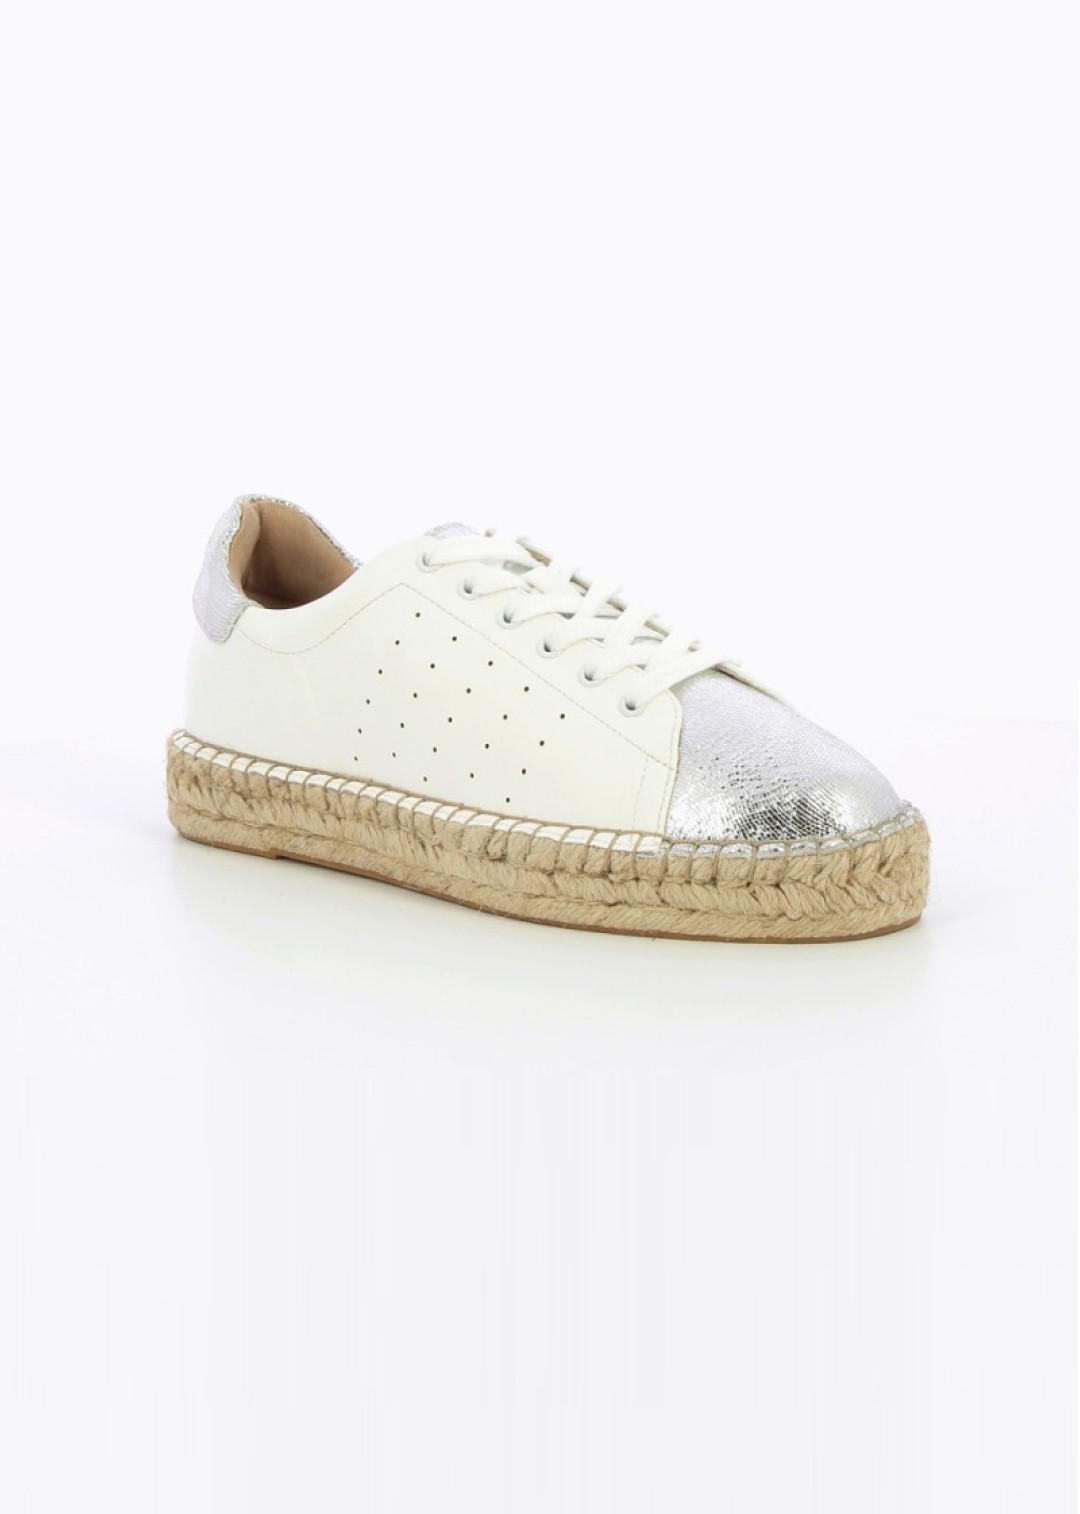 baskets espadrilles blanches & argent.